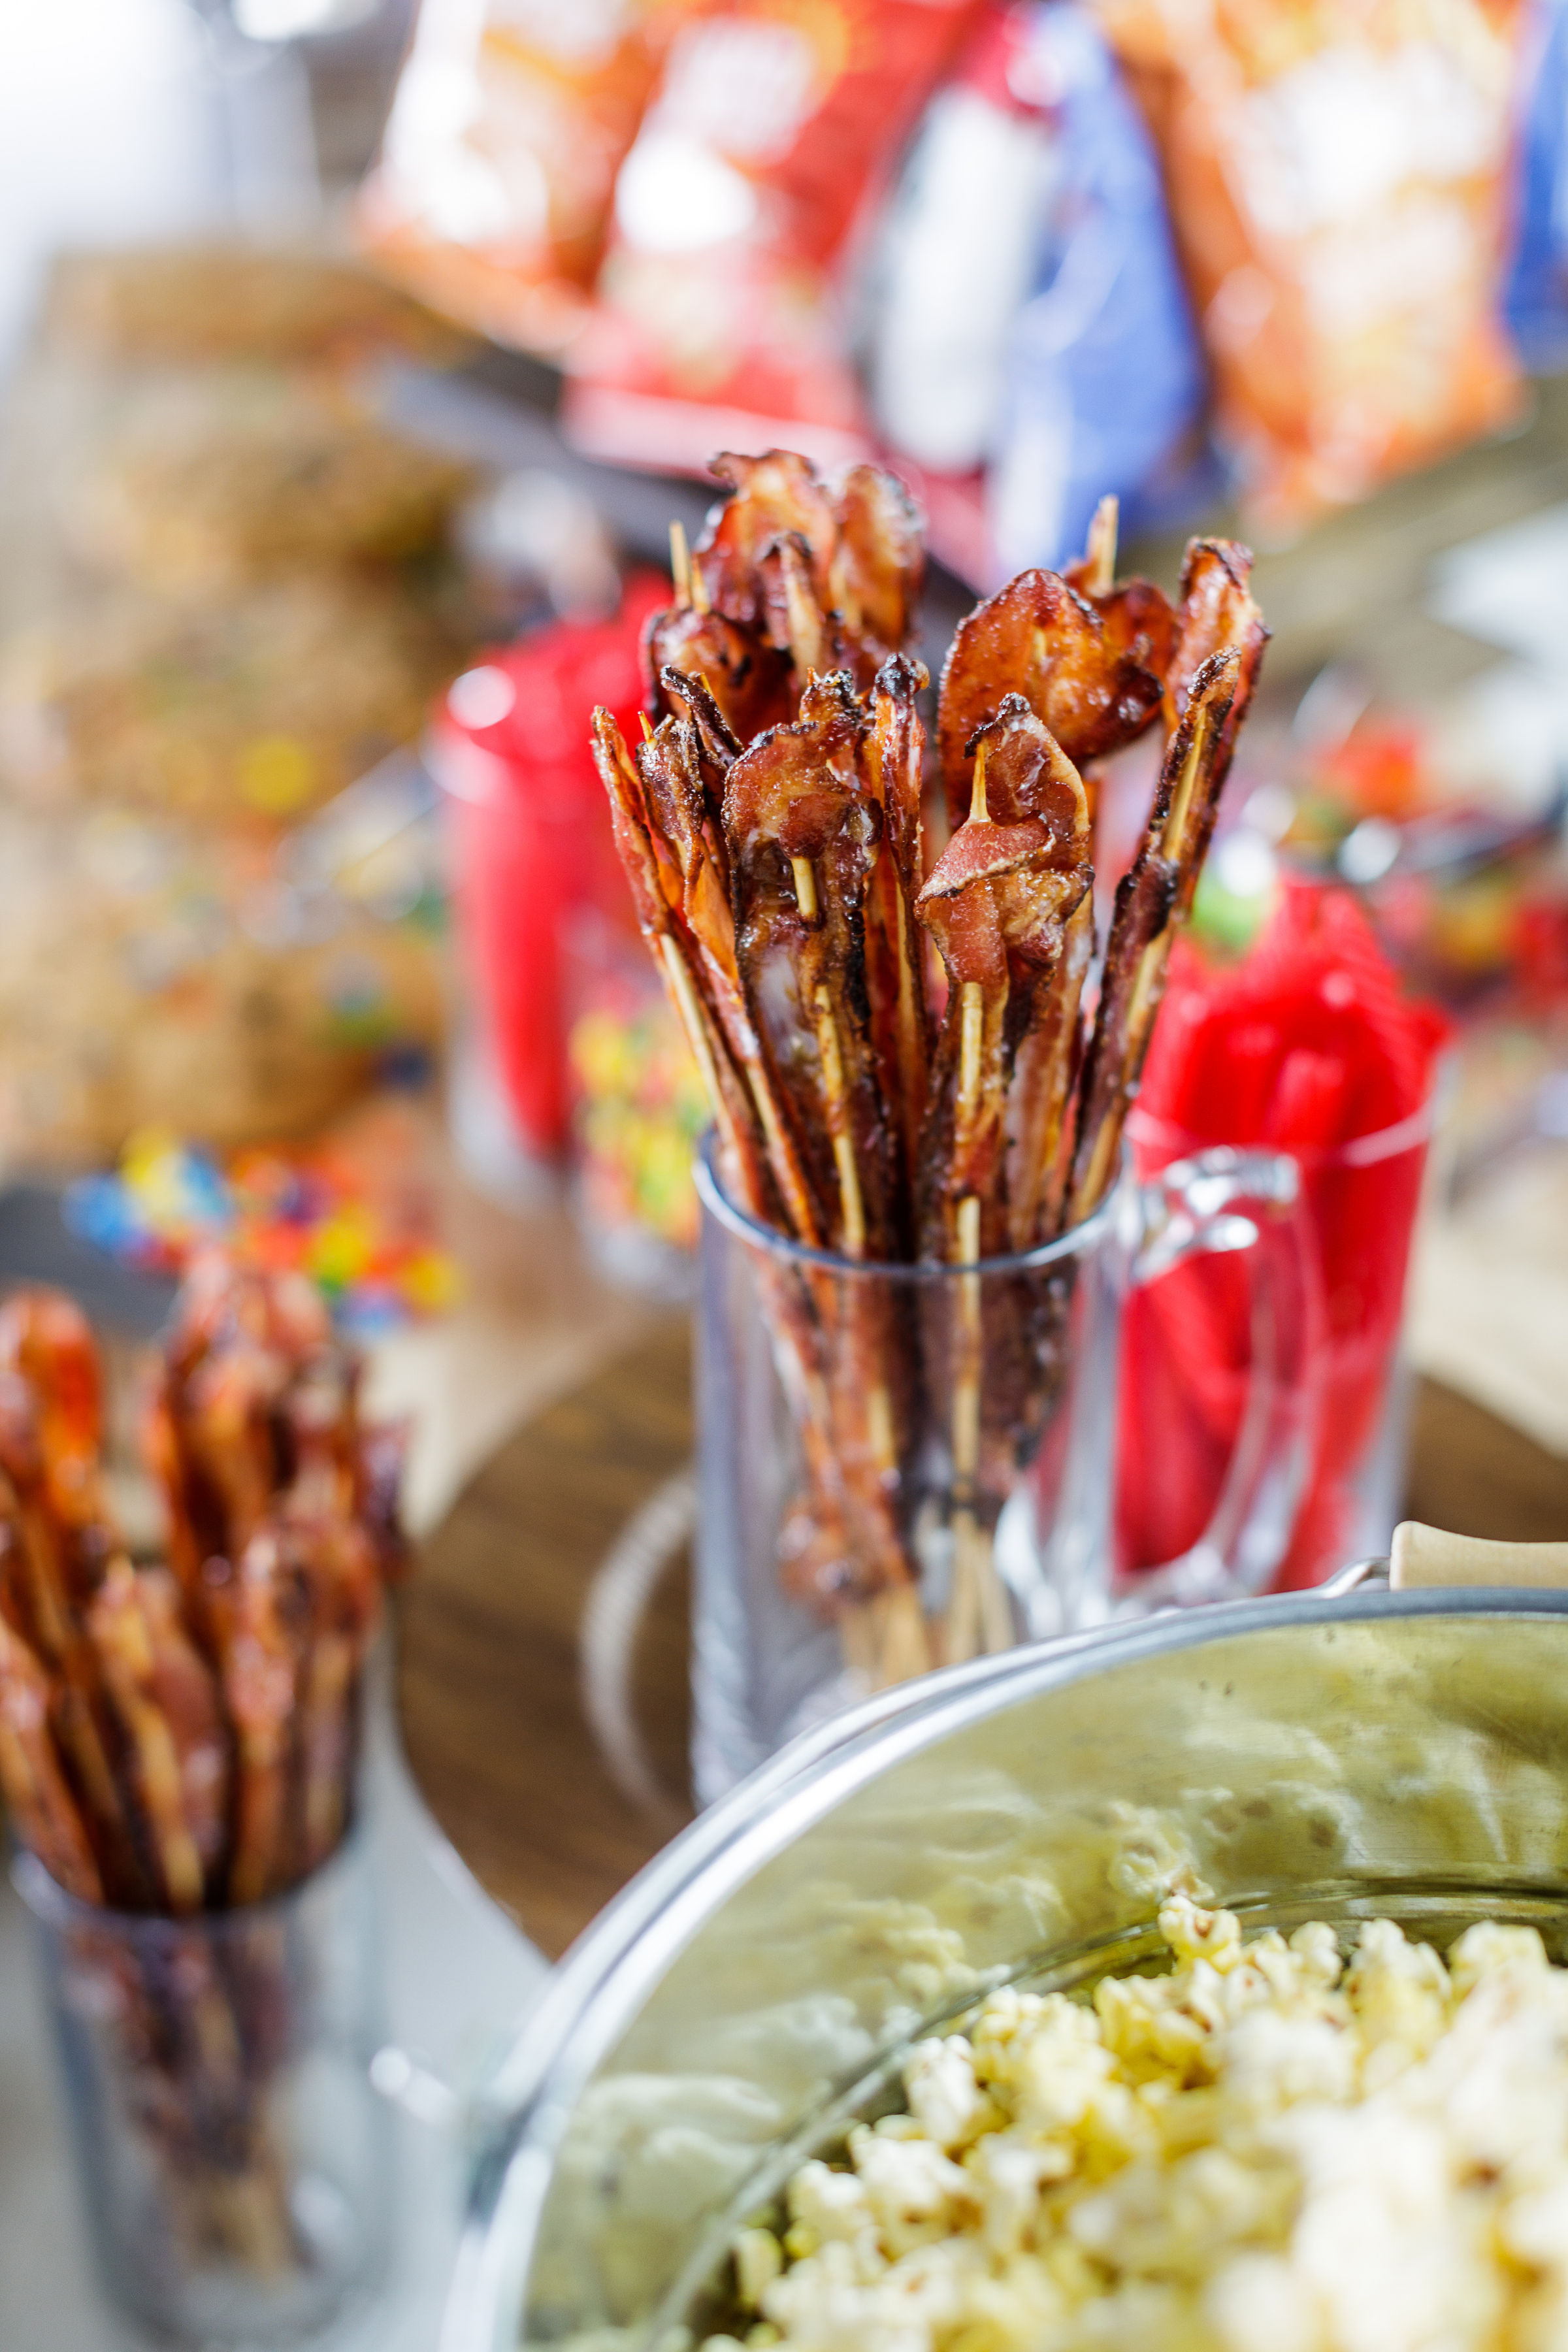 www.santabarbarawedding.com | Kiel Rucker Photography | Creative Services Catering | The Ocean View Farm | Maple-Glazed Bacon Snack Sticks